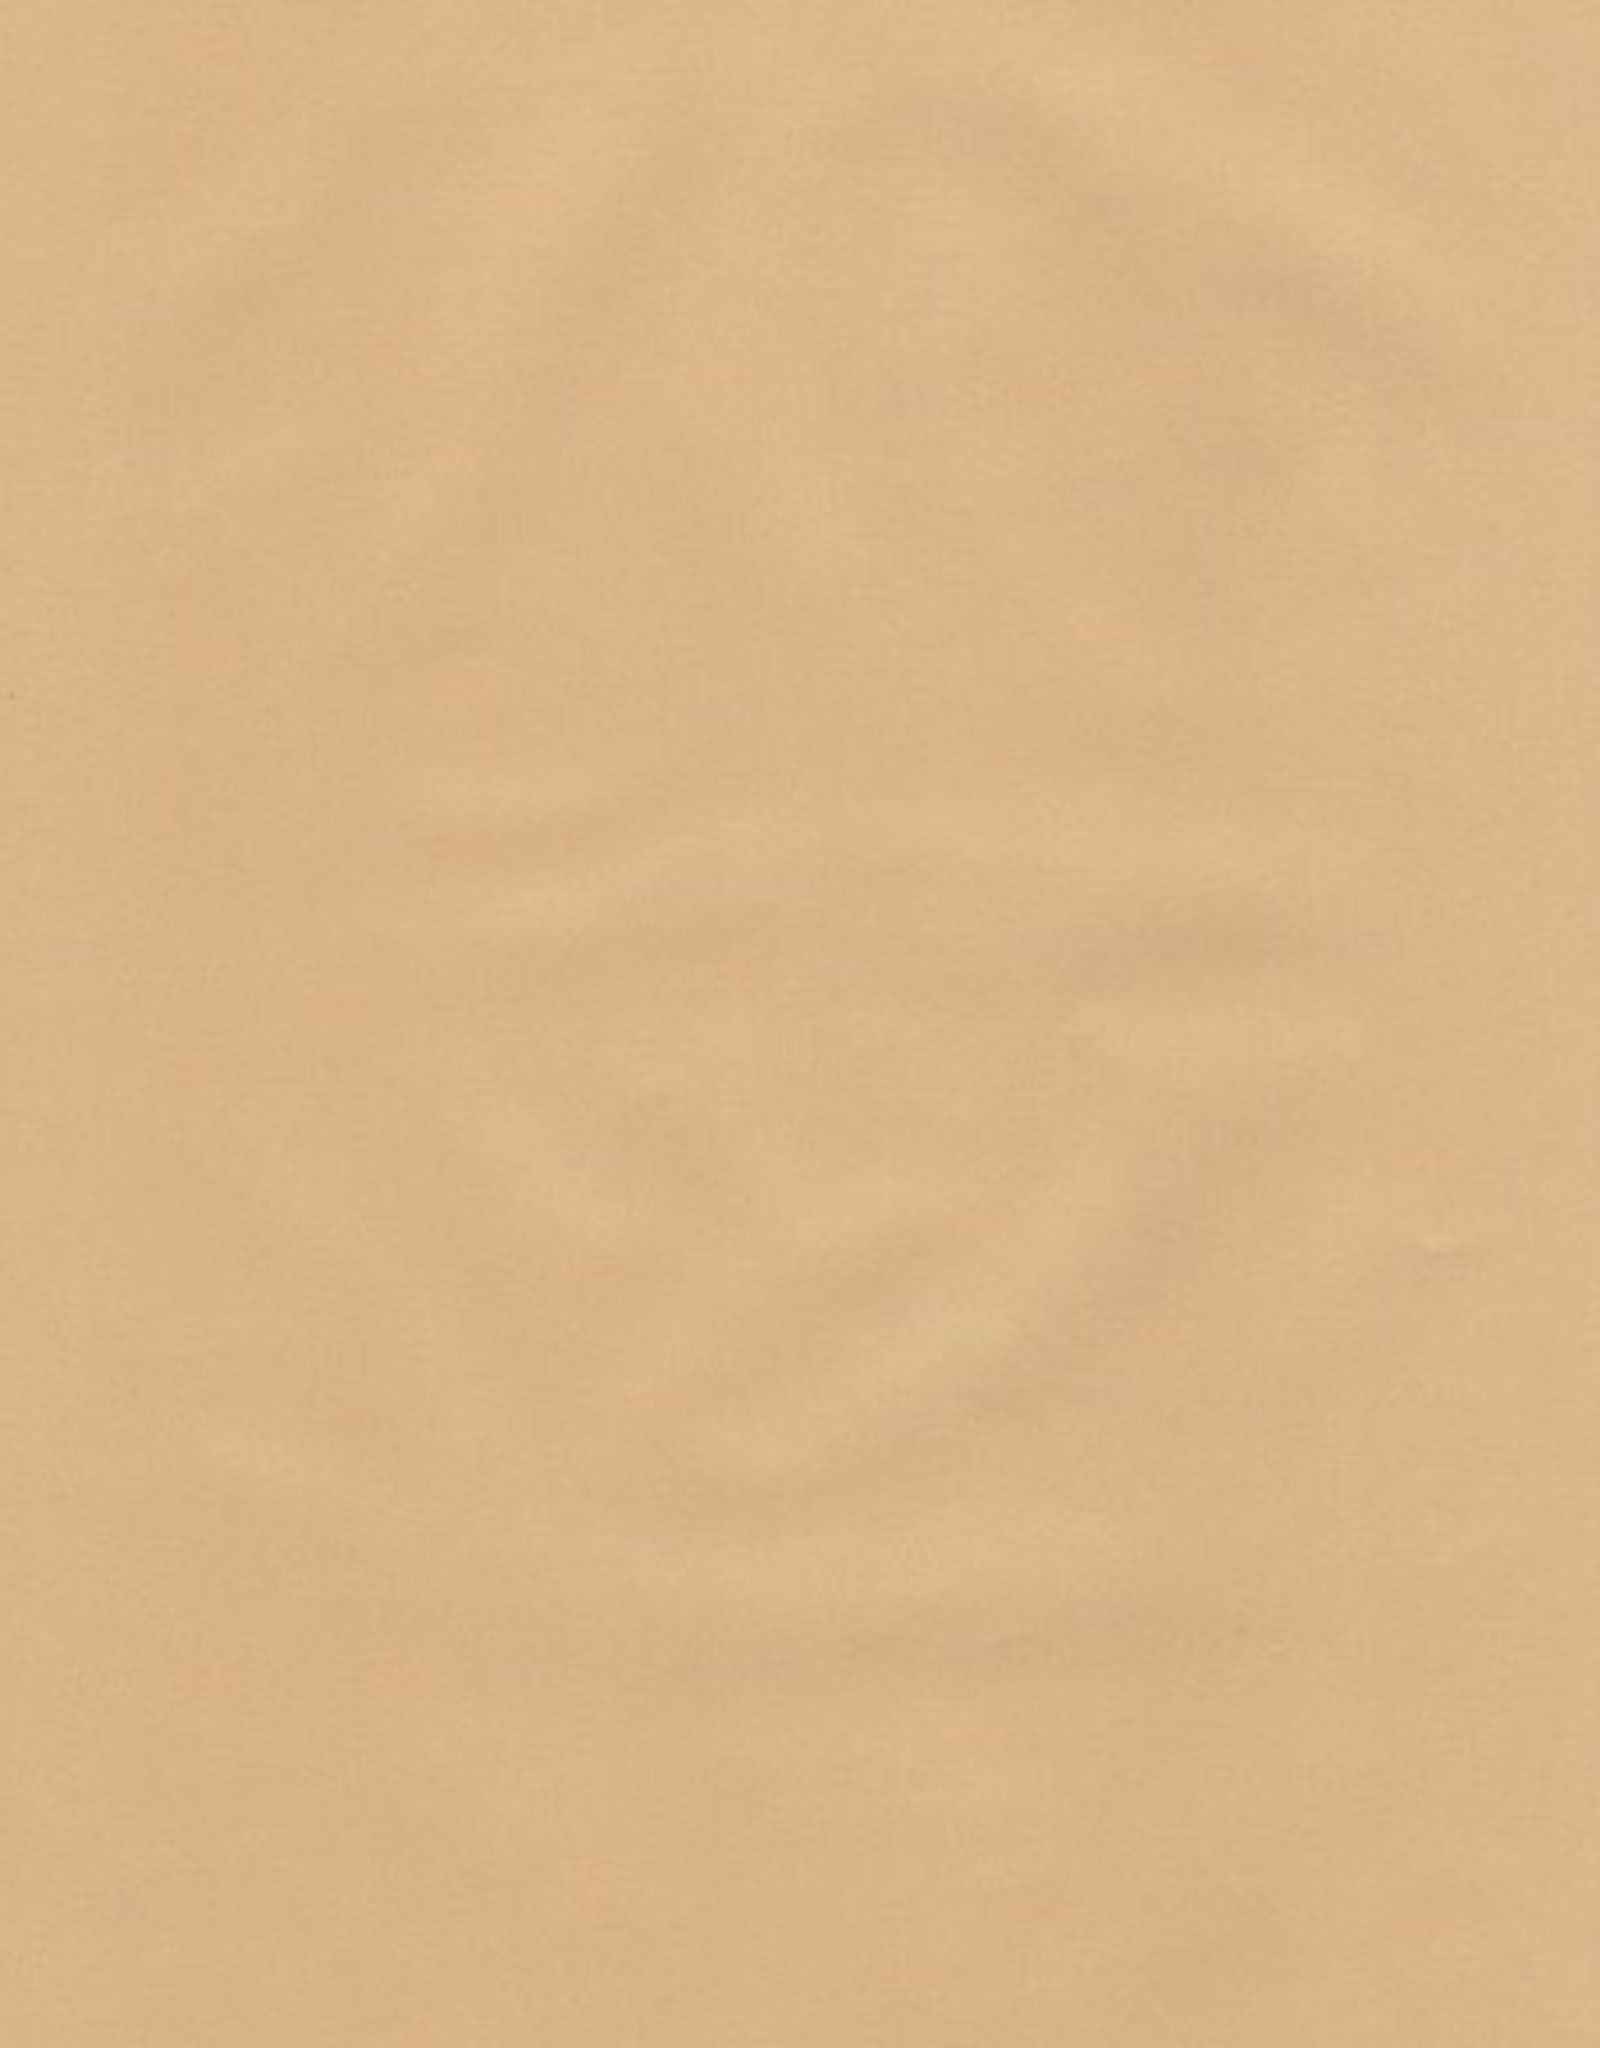 "Chartham Tracing Vellum, 30#, Gold, 8.5"" x 11"""